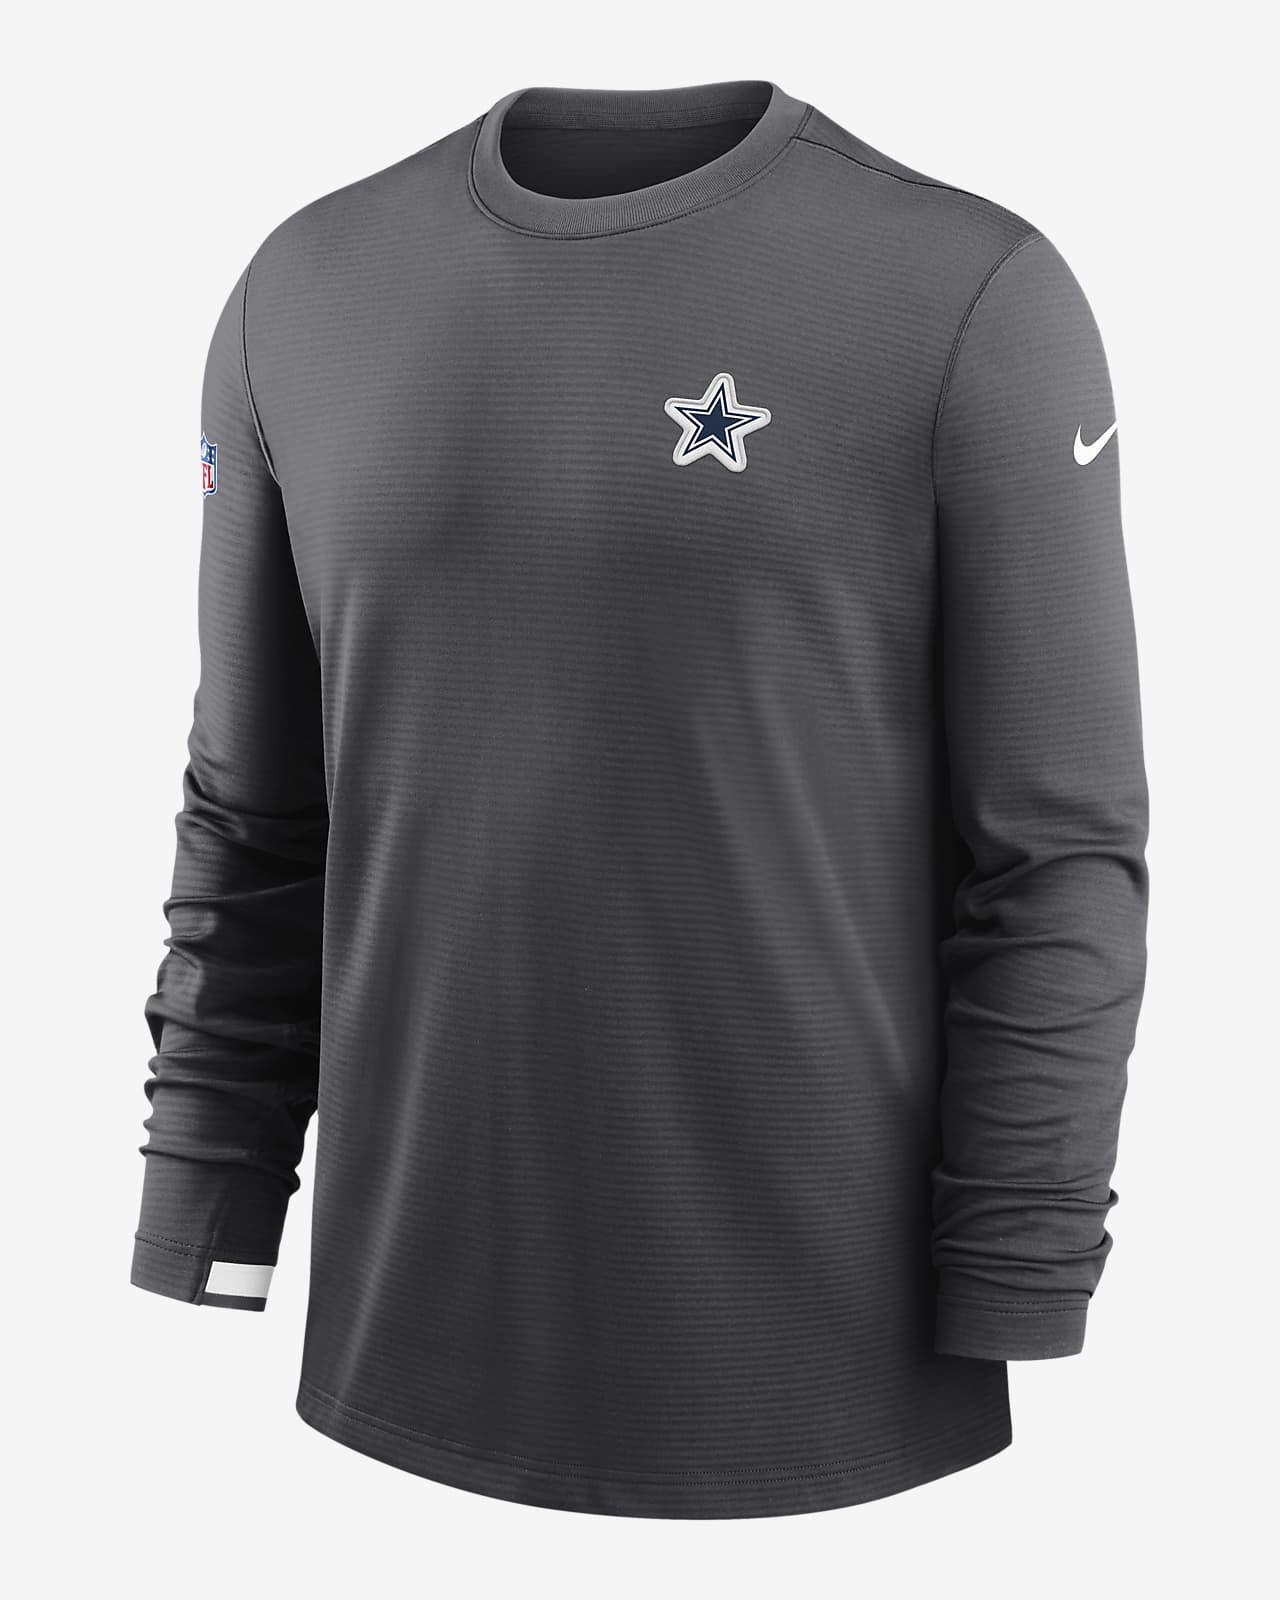 Nike Dri-FIT (NFL Cowboys) Men's Long-Sleeve Top